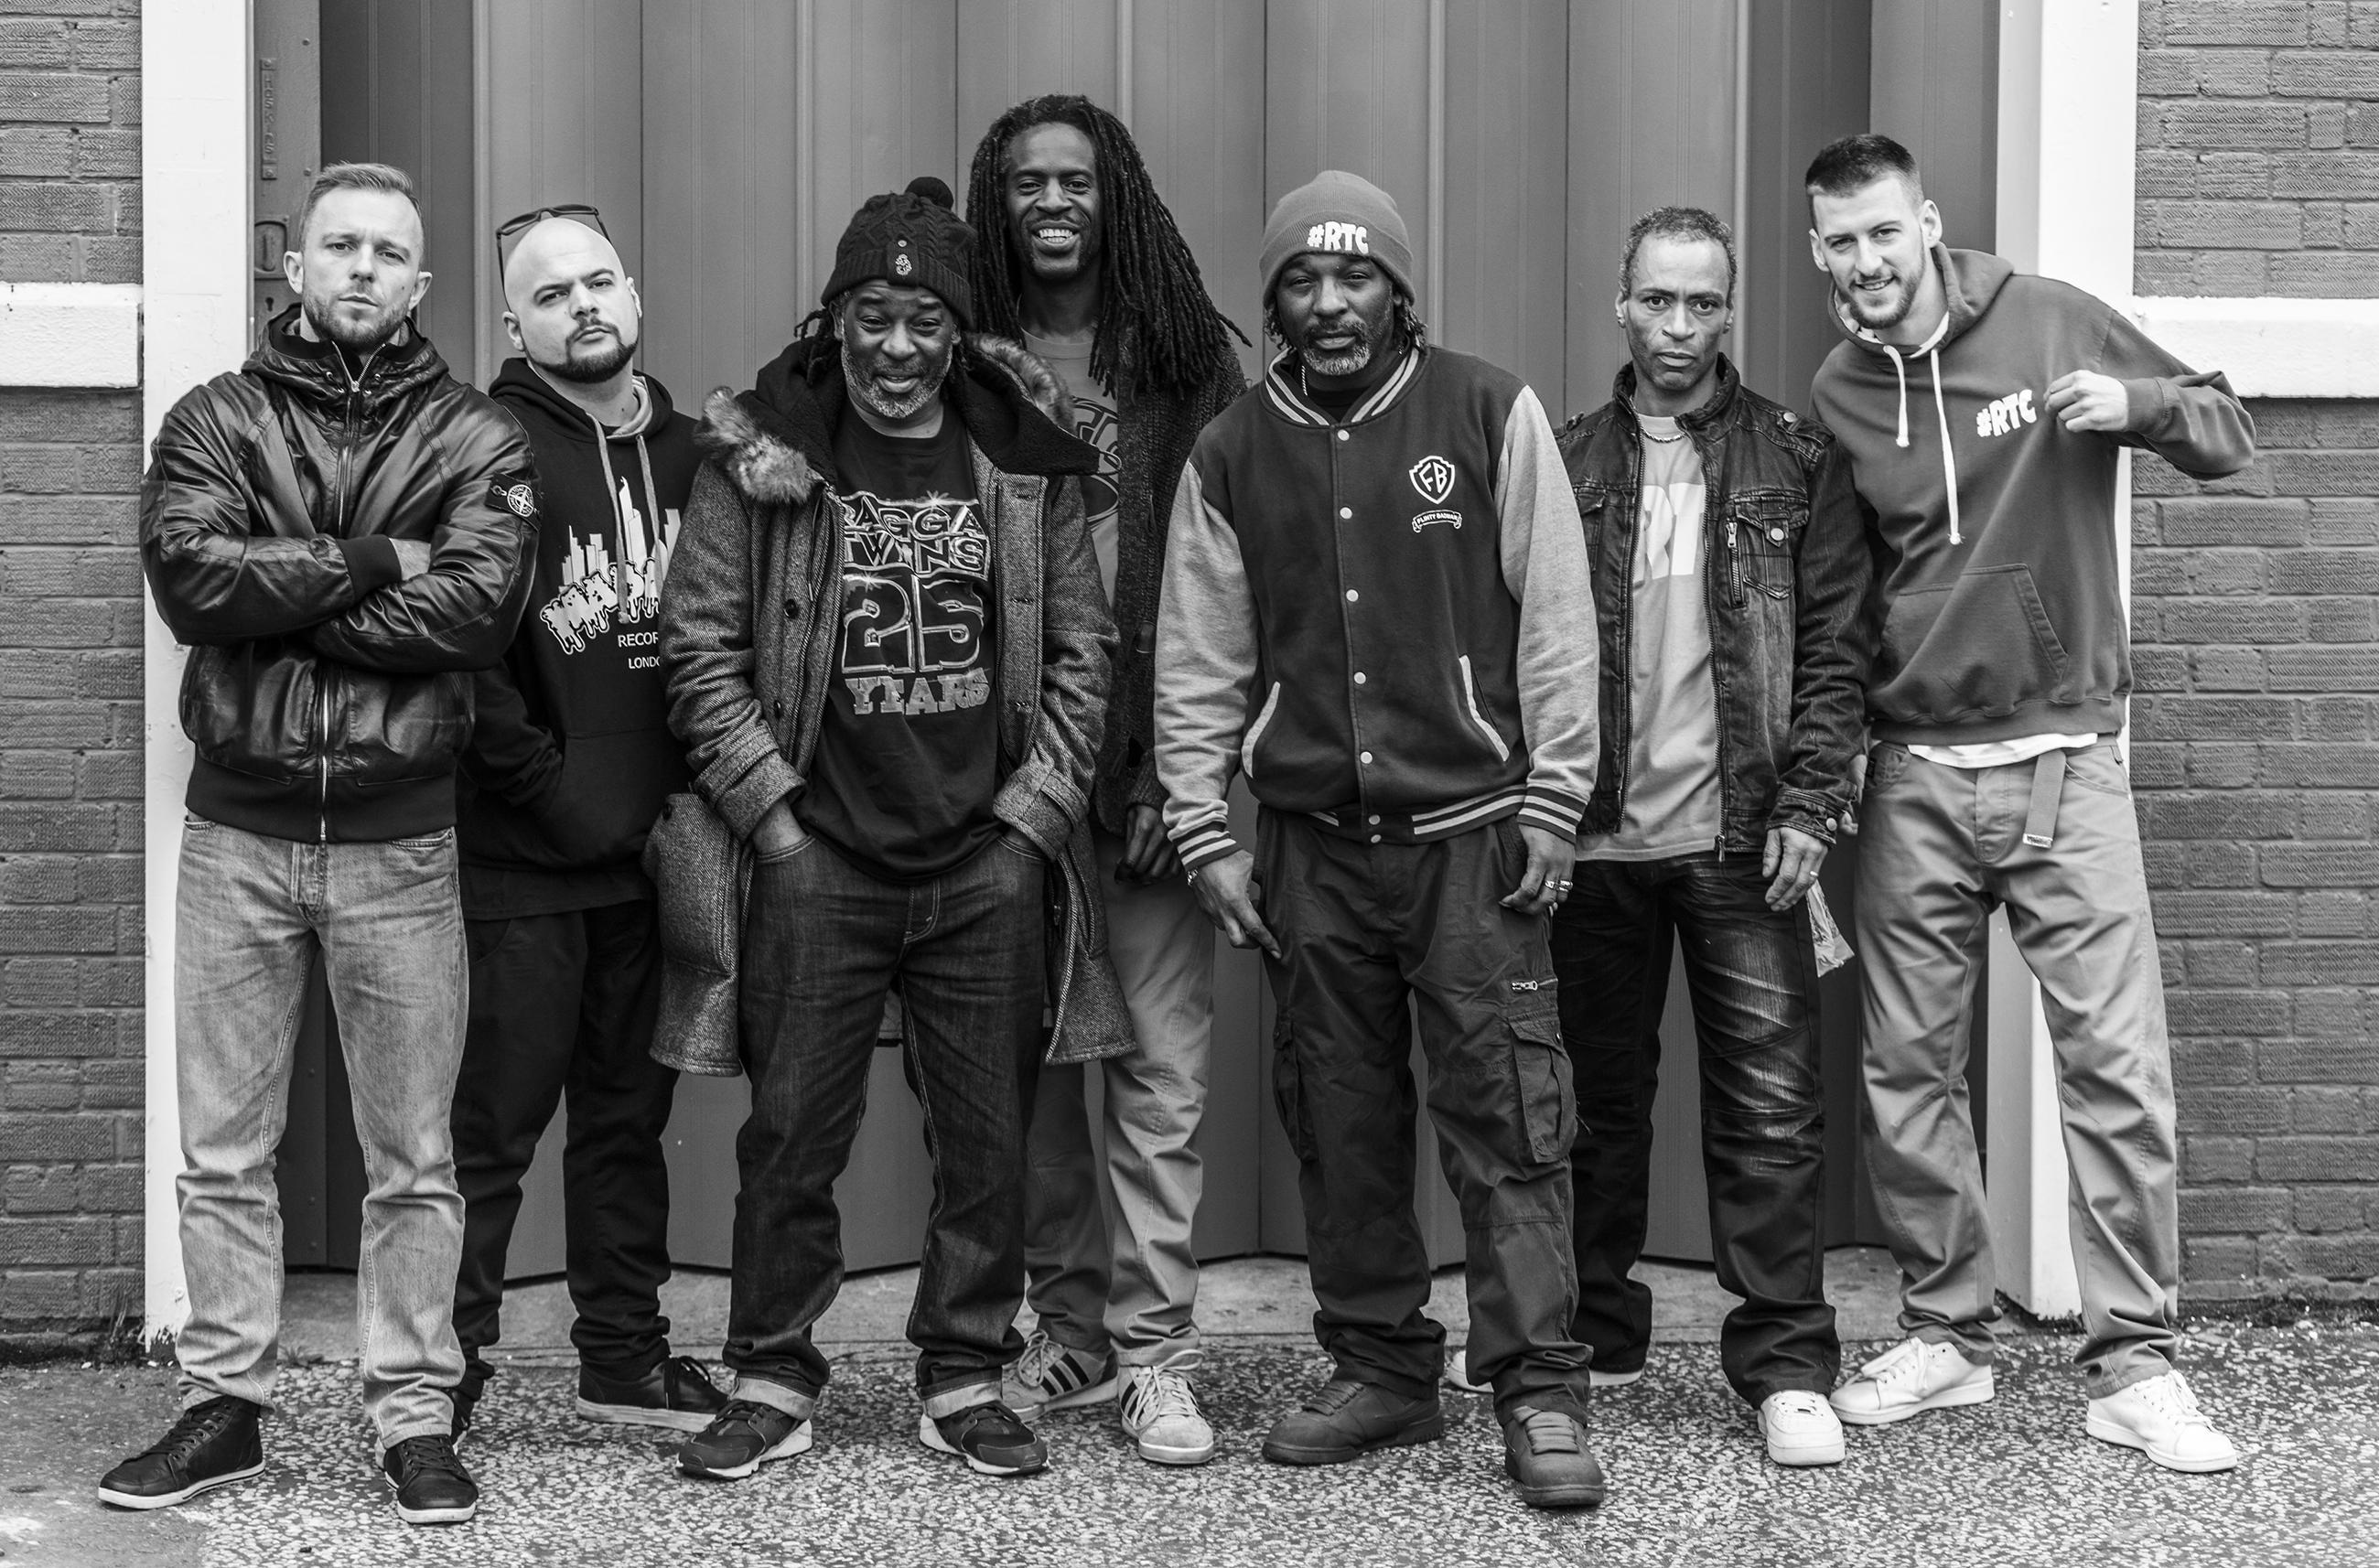 Ragga-Twins-Crew-PyroRadio-PyroRadio.com-Flinty-Badman-Deman-Rockers-MC-Co-Gee-Pedro-Slimer-dj-Danny-Shutdown-DJ-BLAZE-MOORE-Mtek1lla